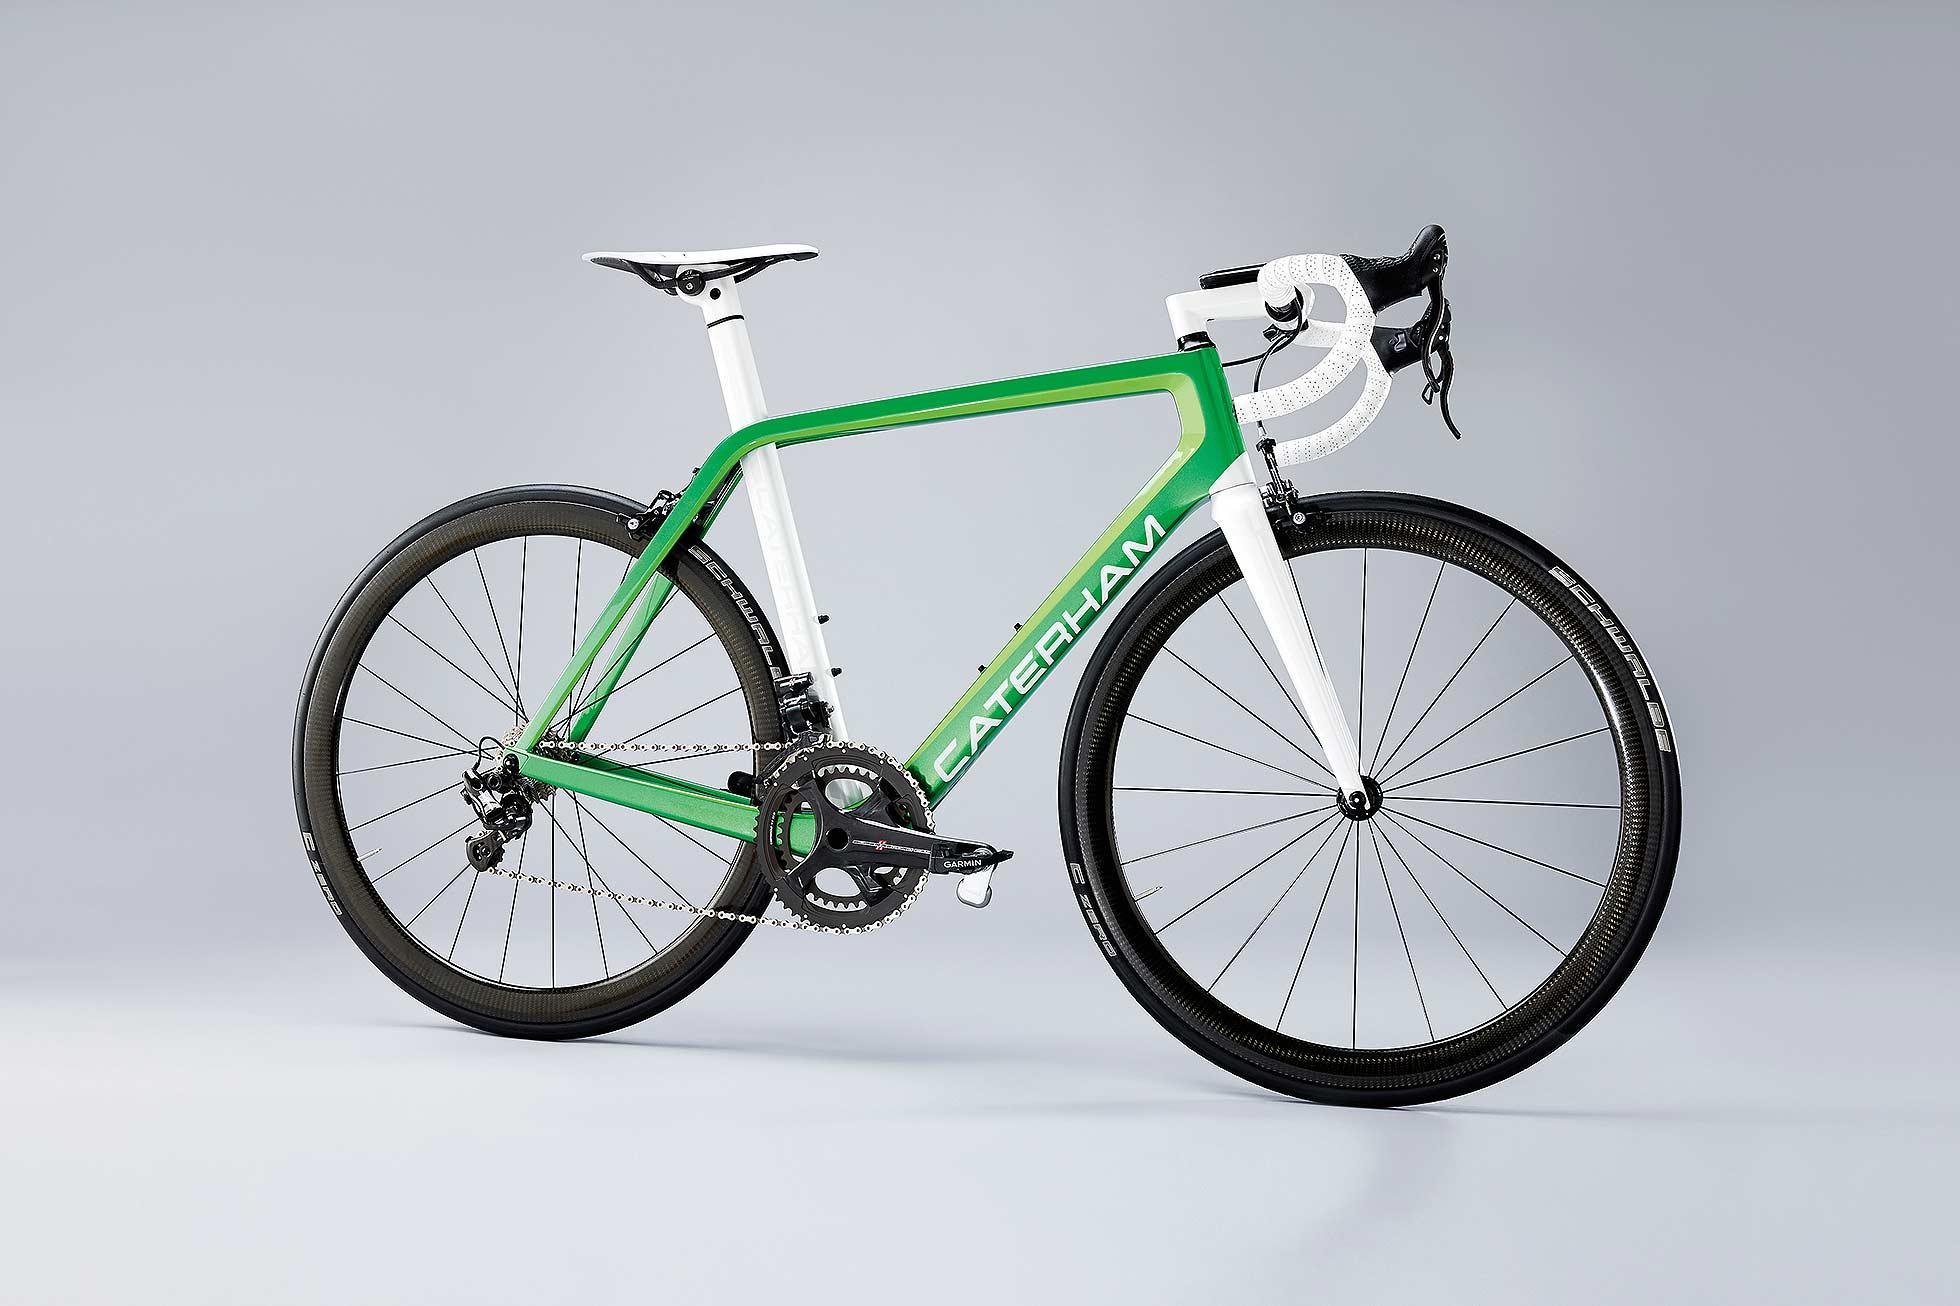 Caterham launches new range of bicycles